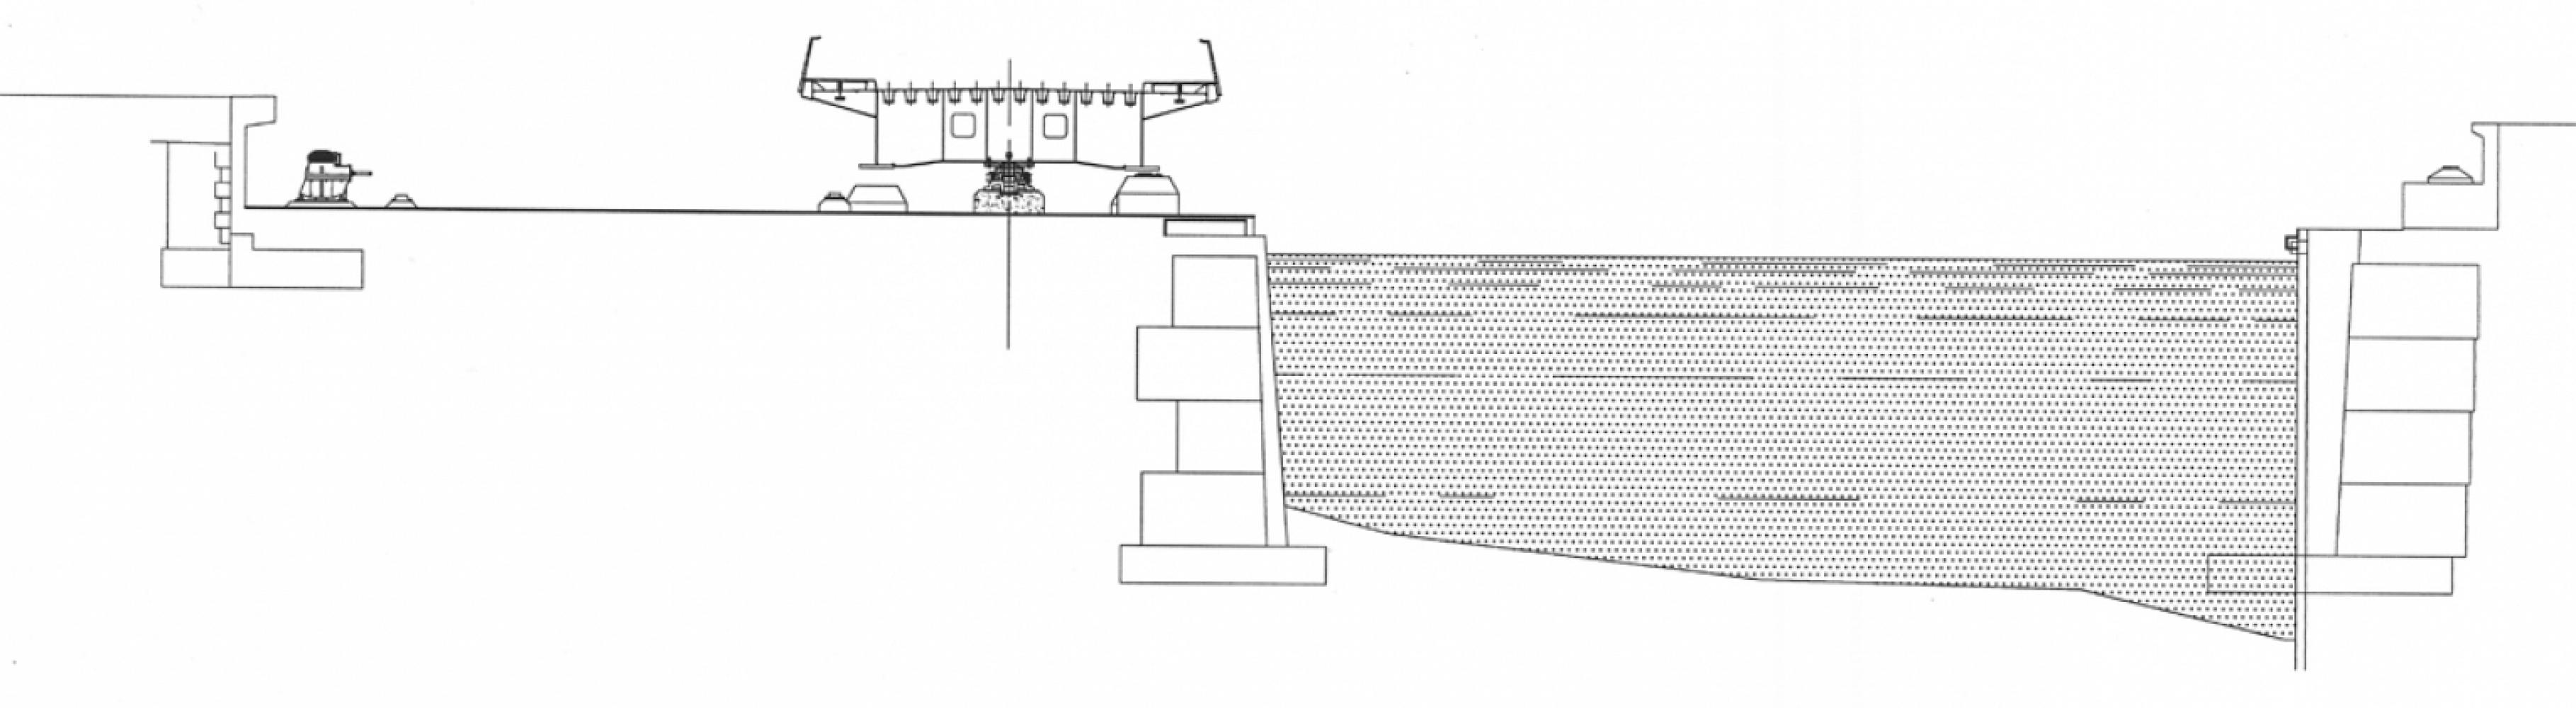 sete01 Pascale SEURIN Architecte - Pascale SEURIN Architecte